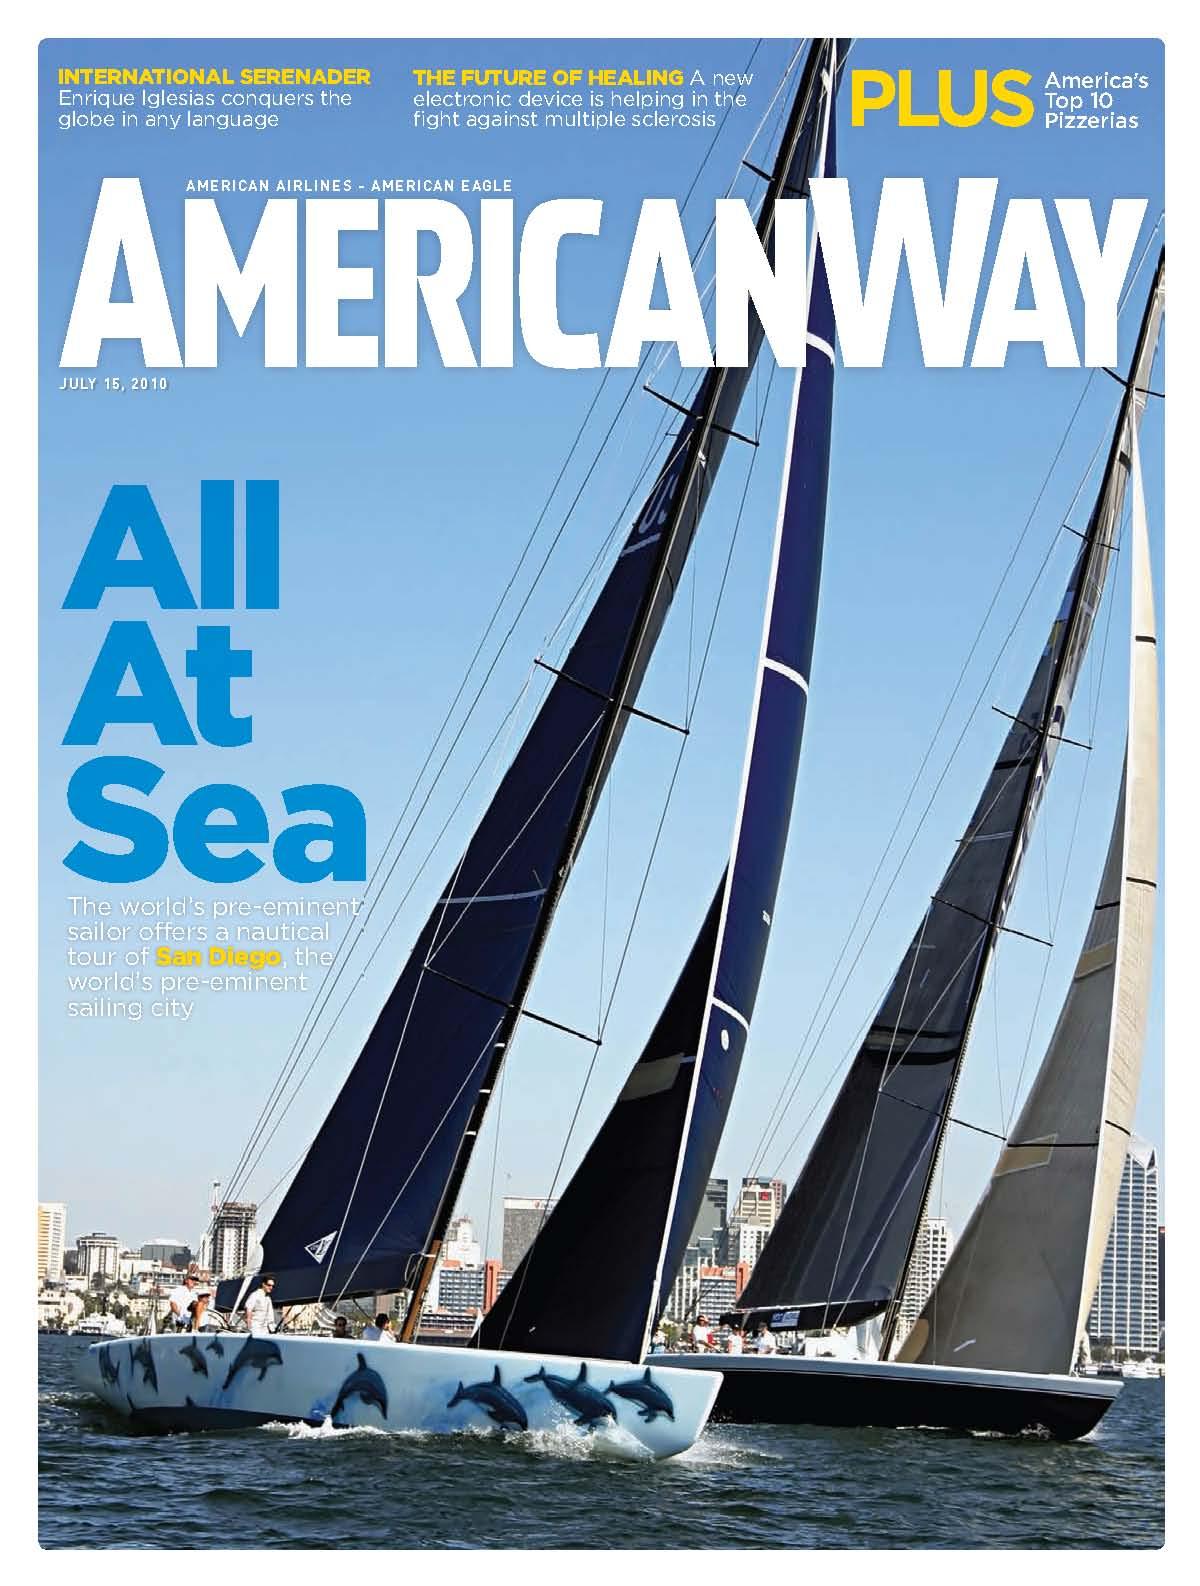 American Way San Diego Sailing Cover - San Diego Travel Blog